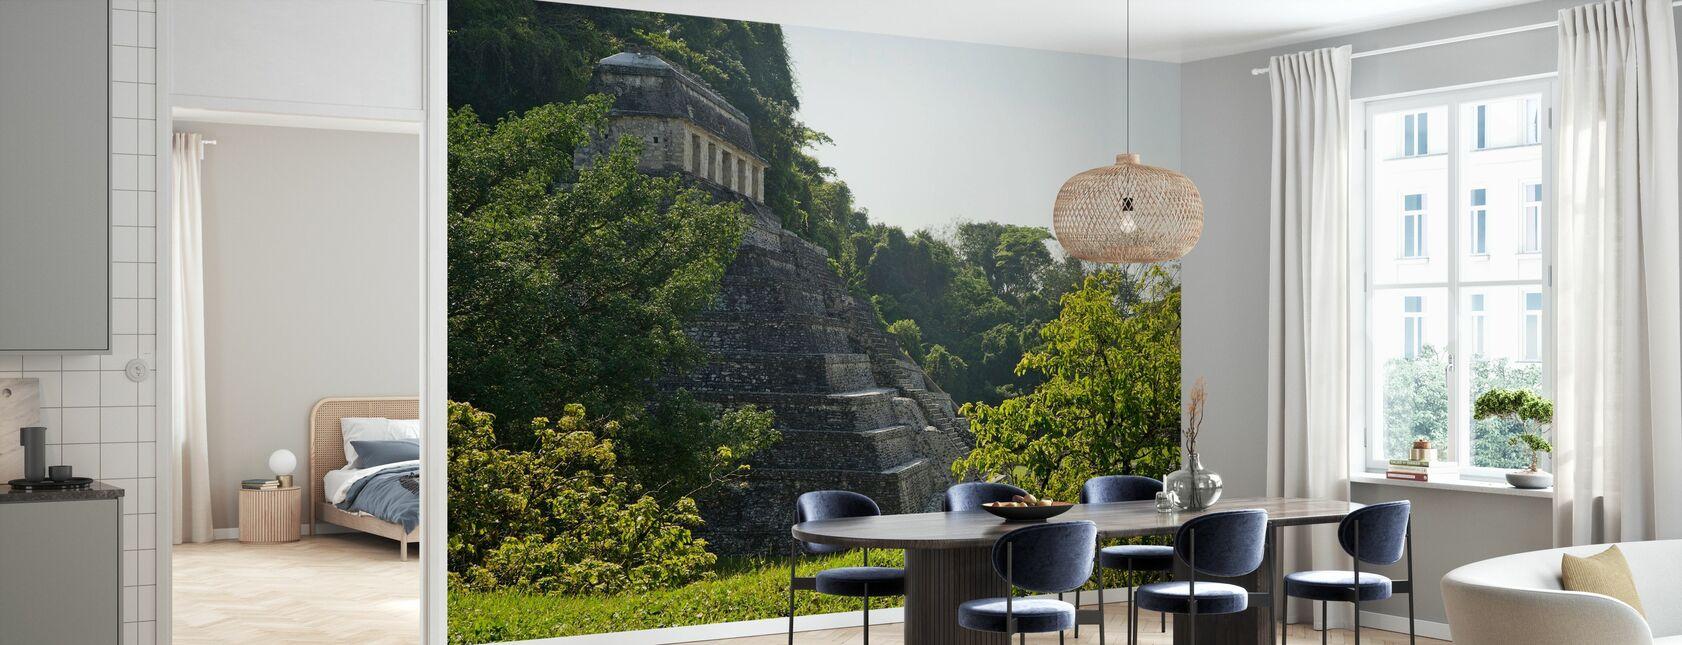 De Palenque Maya-ruïnes, Mexico - Behang - Keuken